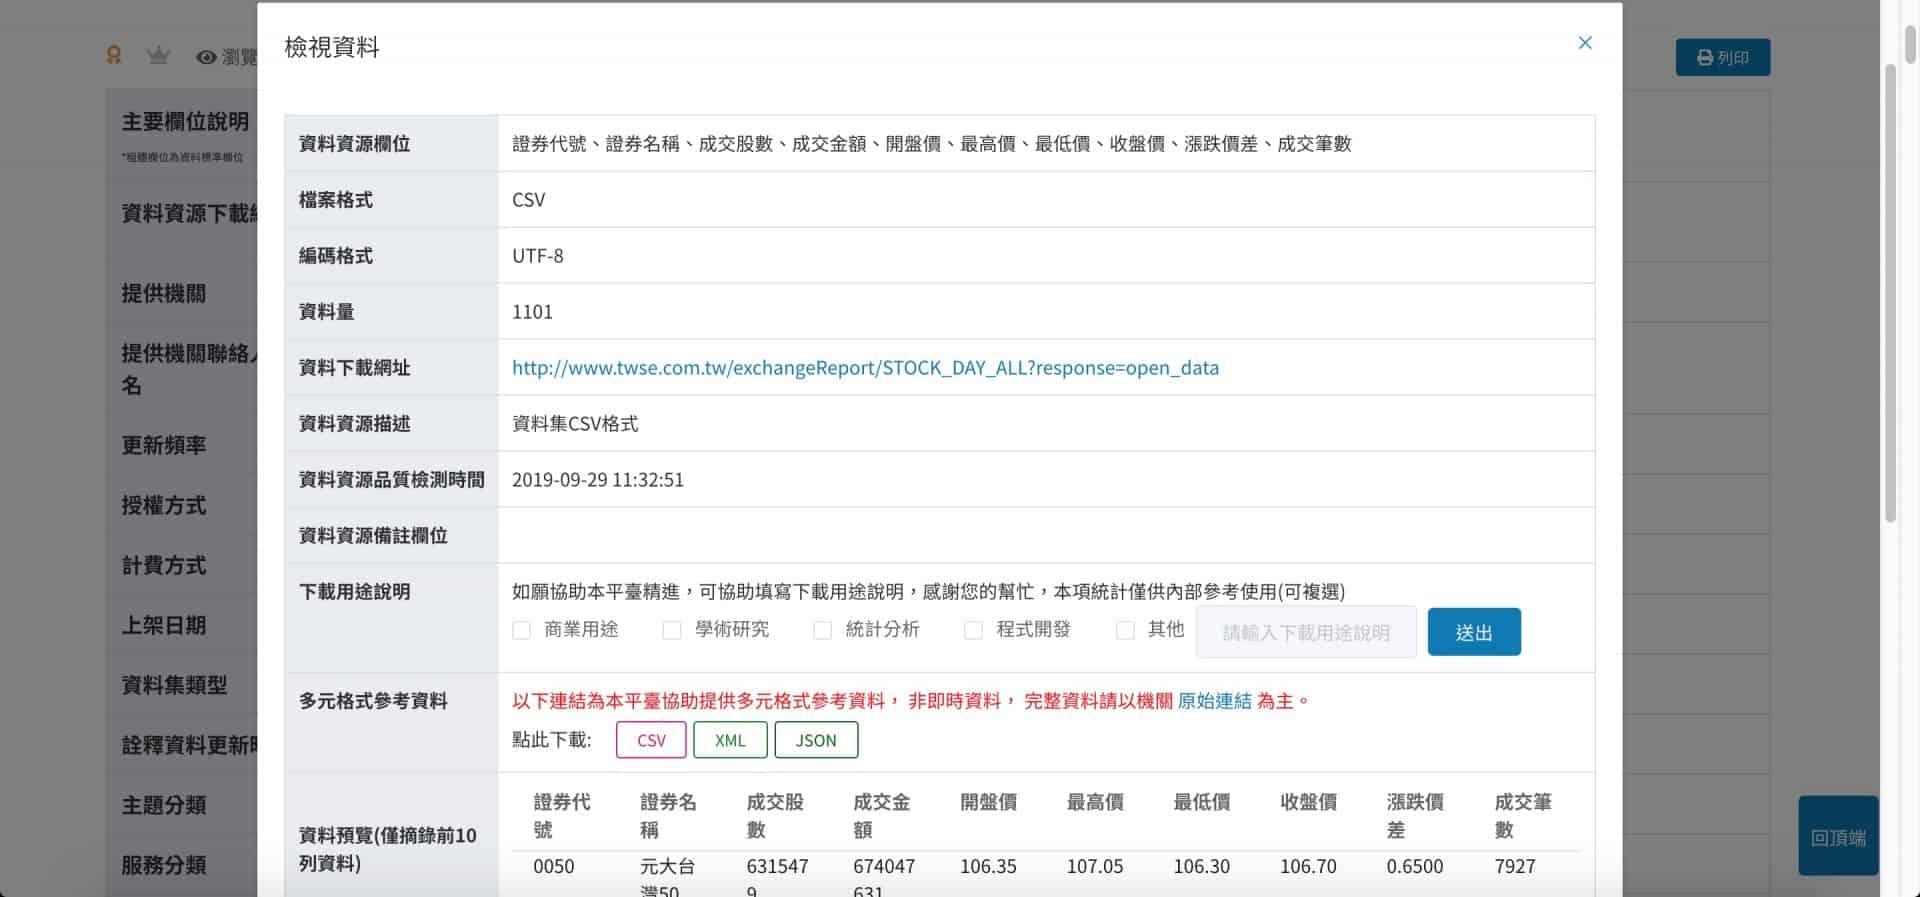 Python - 透過證交所開放資料API抓取台股當日交易資訊 - 檢視資料